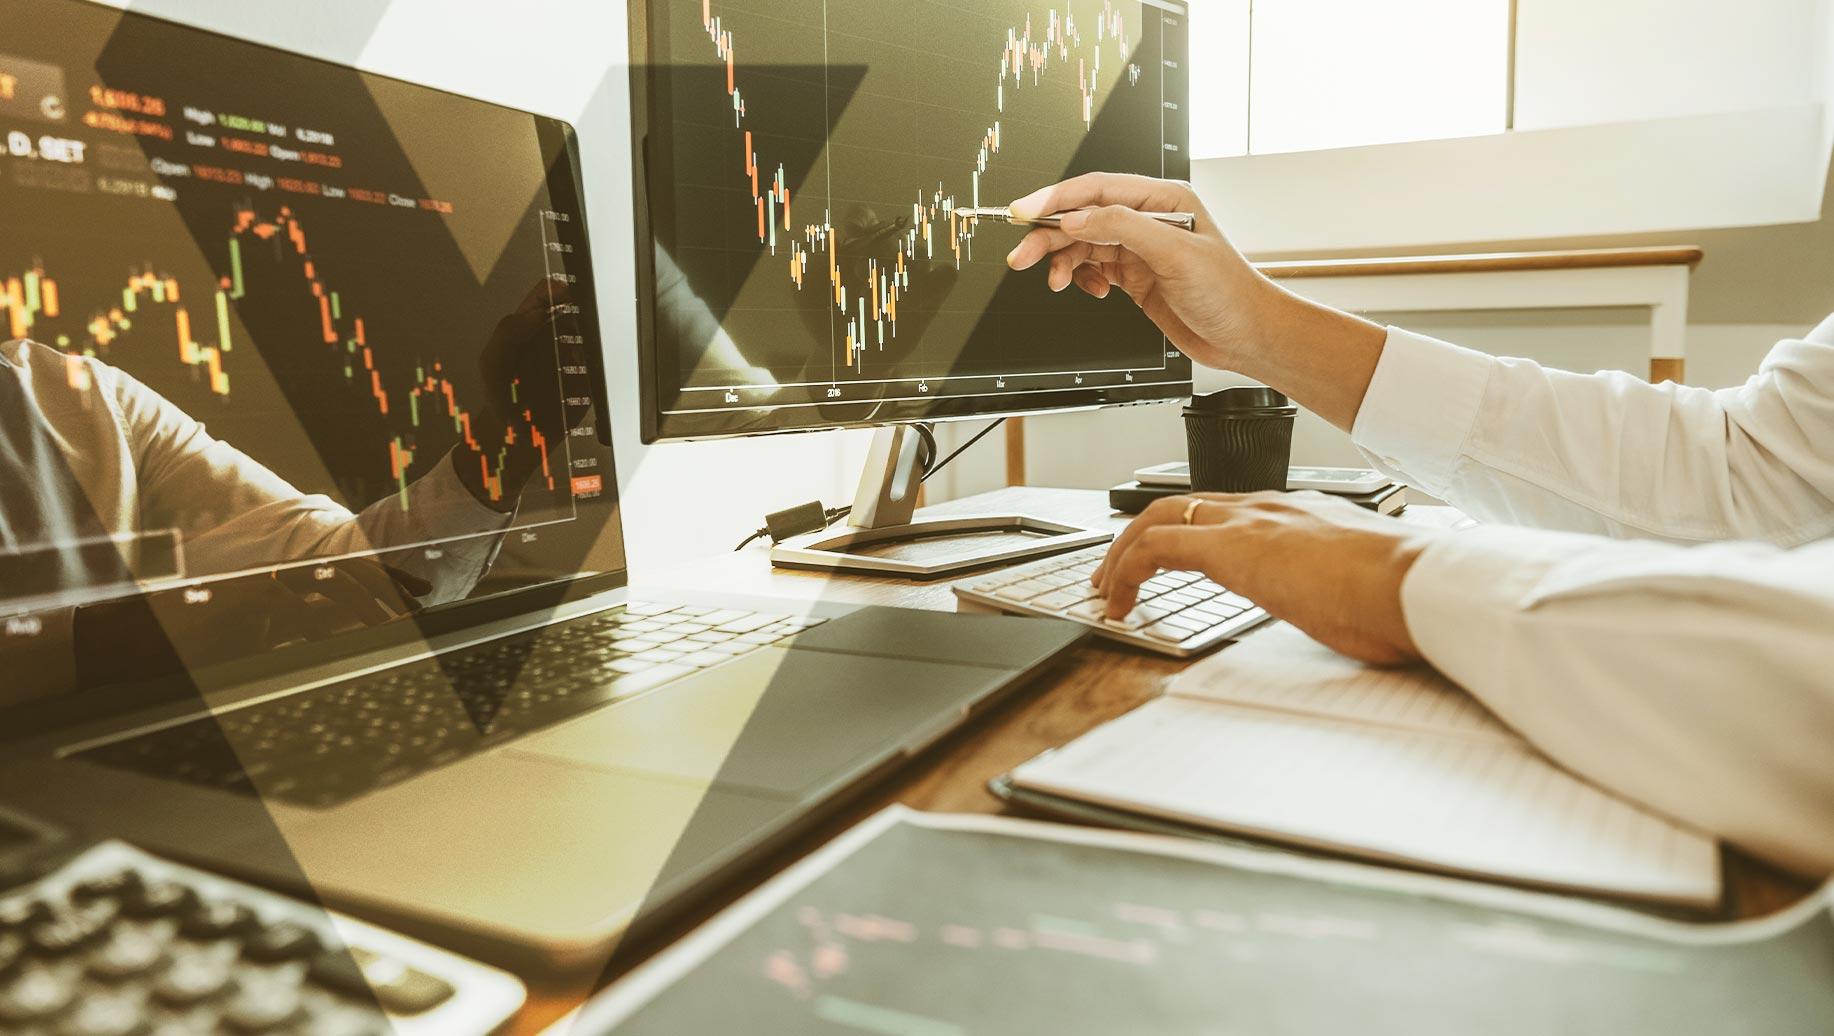 Valuation Of Securities Using Standard Valuation Methods